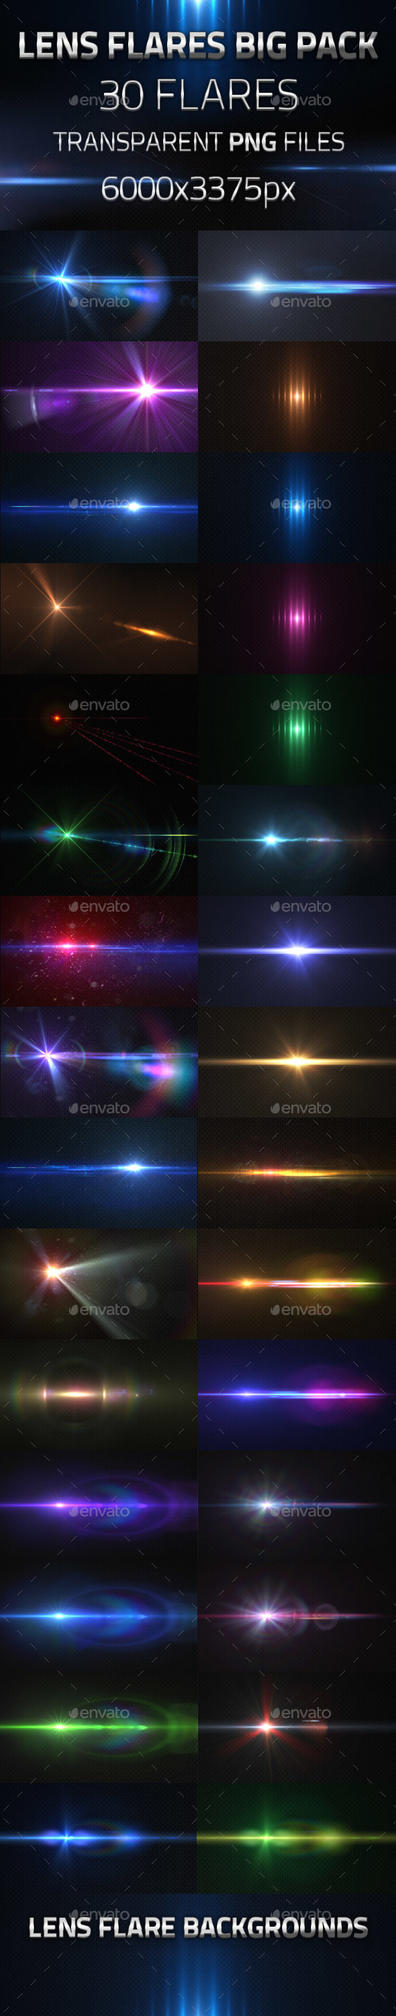 30 Lens Flares Pack by virusowy